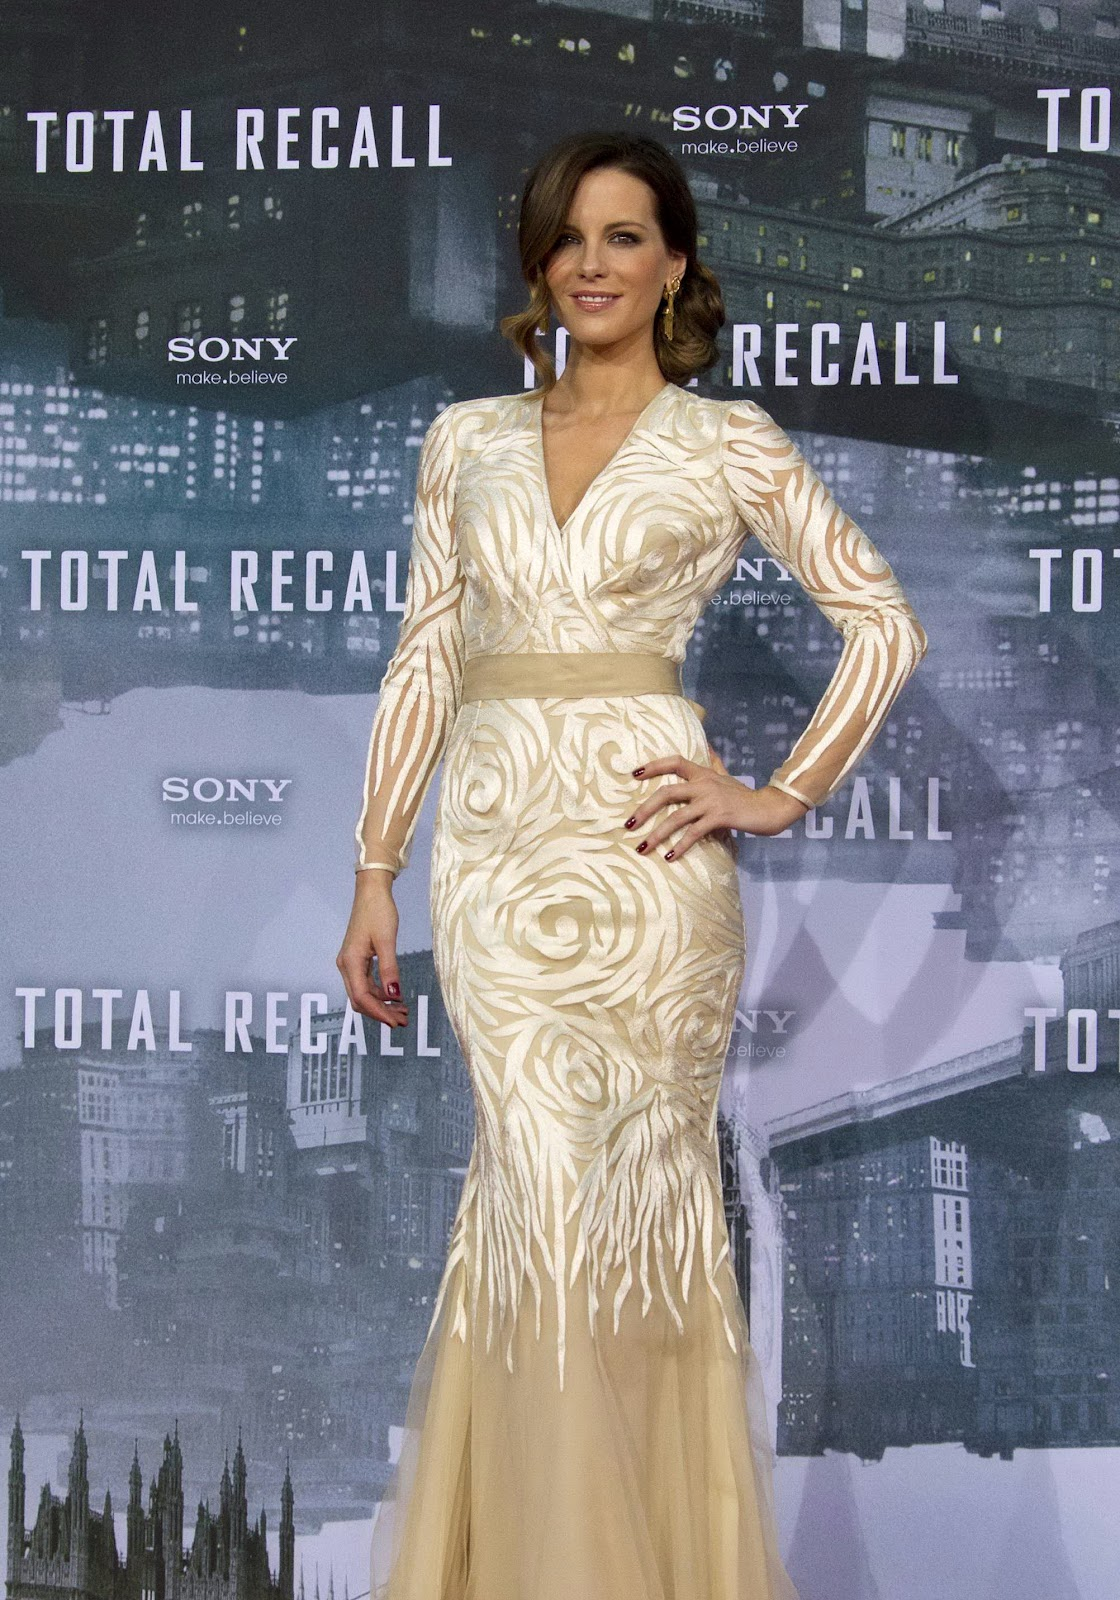 http://1.bp.blogspot.com/-DqSW8_Mm6Lg/UClRWOBdASI/AAAAAAAALXs/48y12jCI39Y/s1600/Kate+Beckinsale+attends+Total+Recall++Premiere+in+Berlin+Germany.jpg